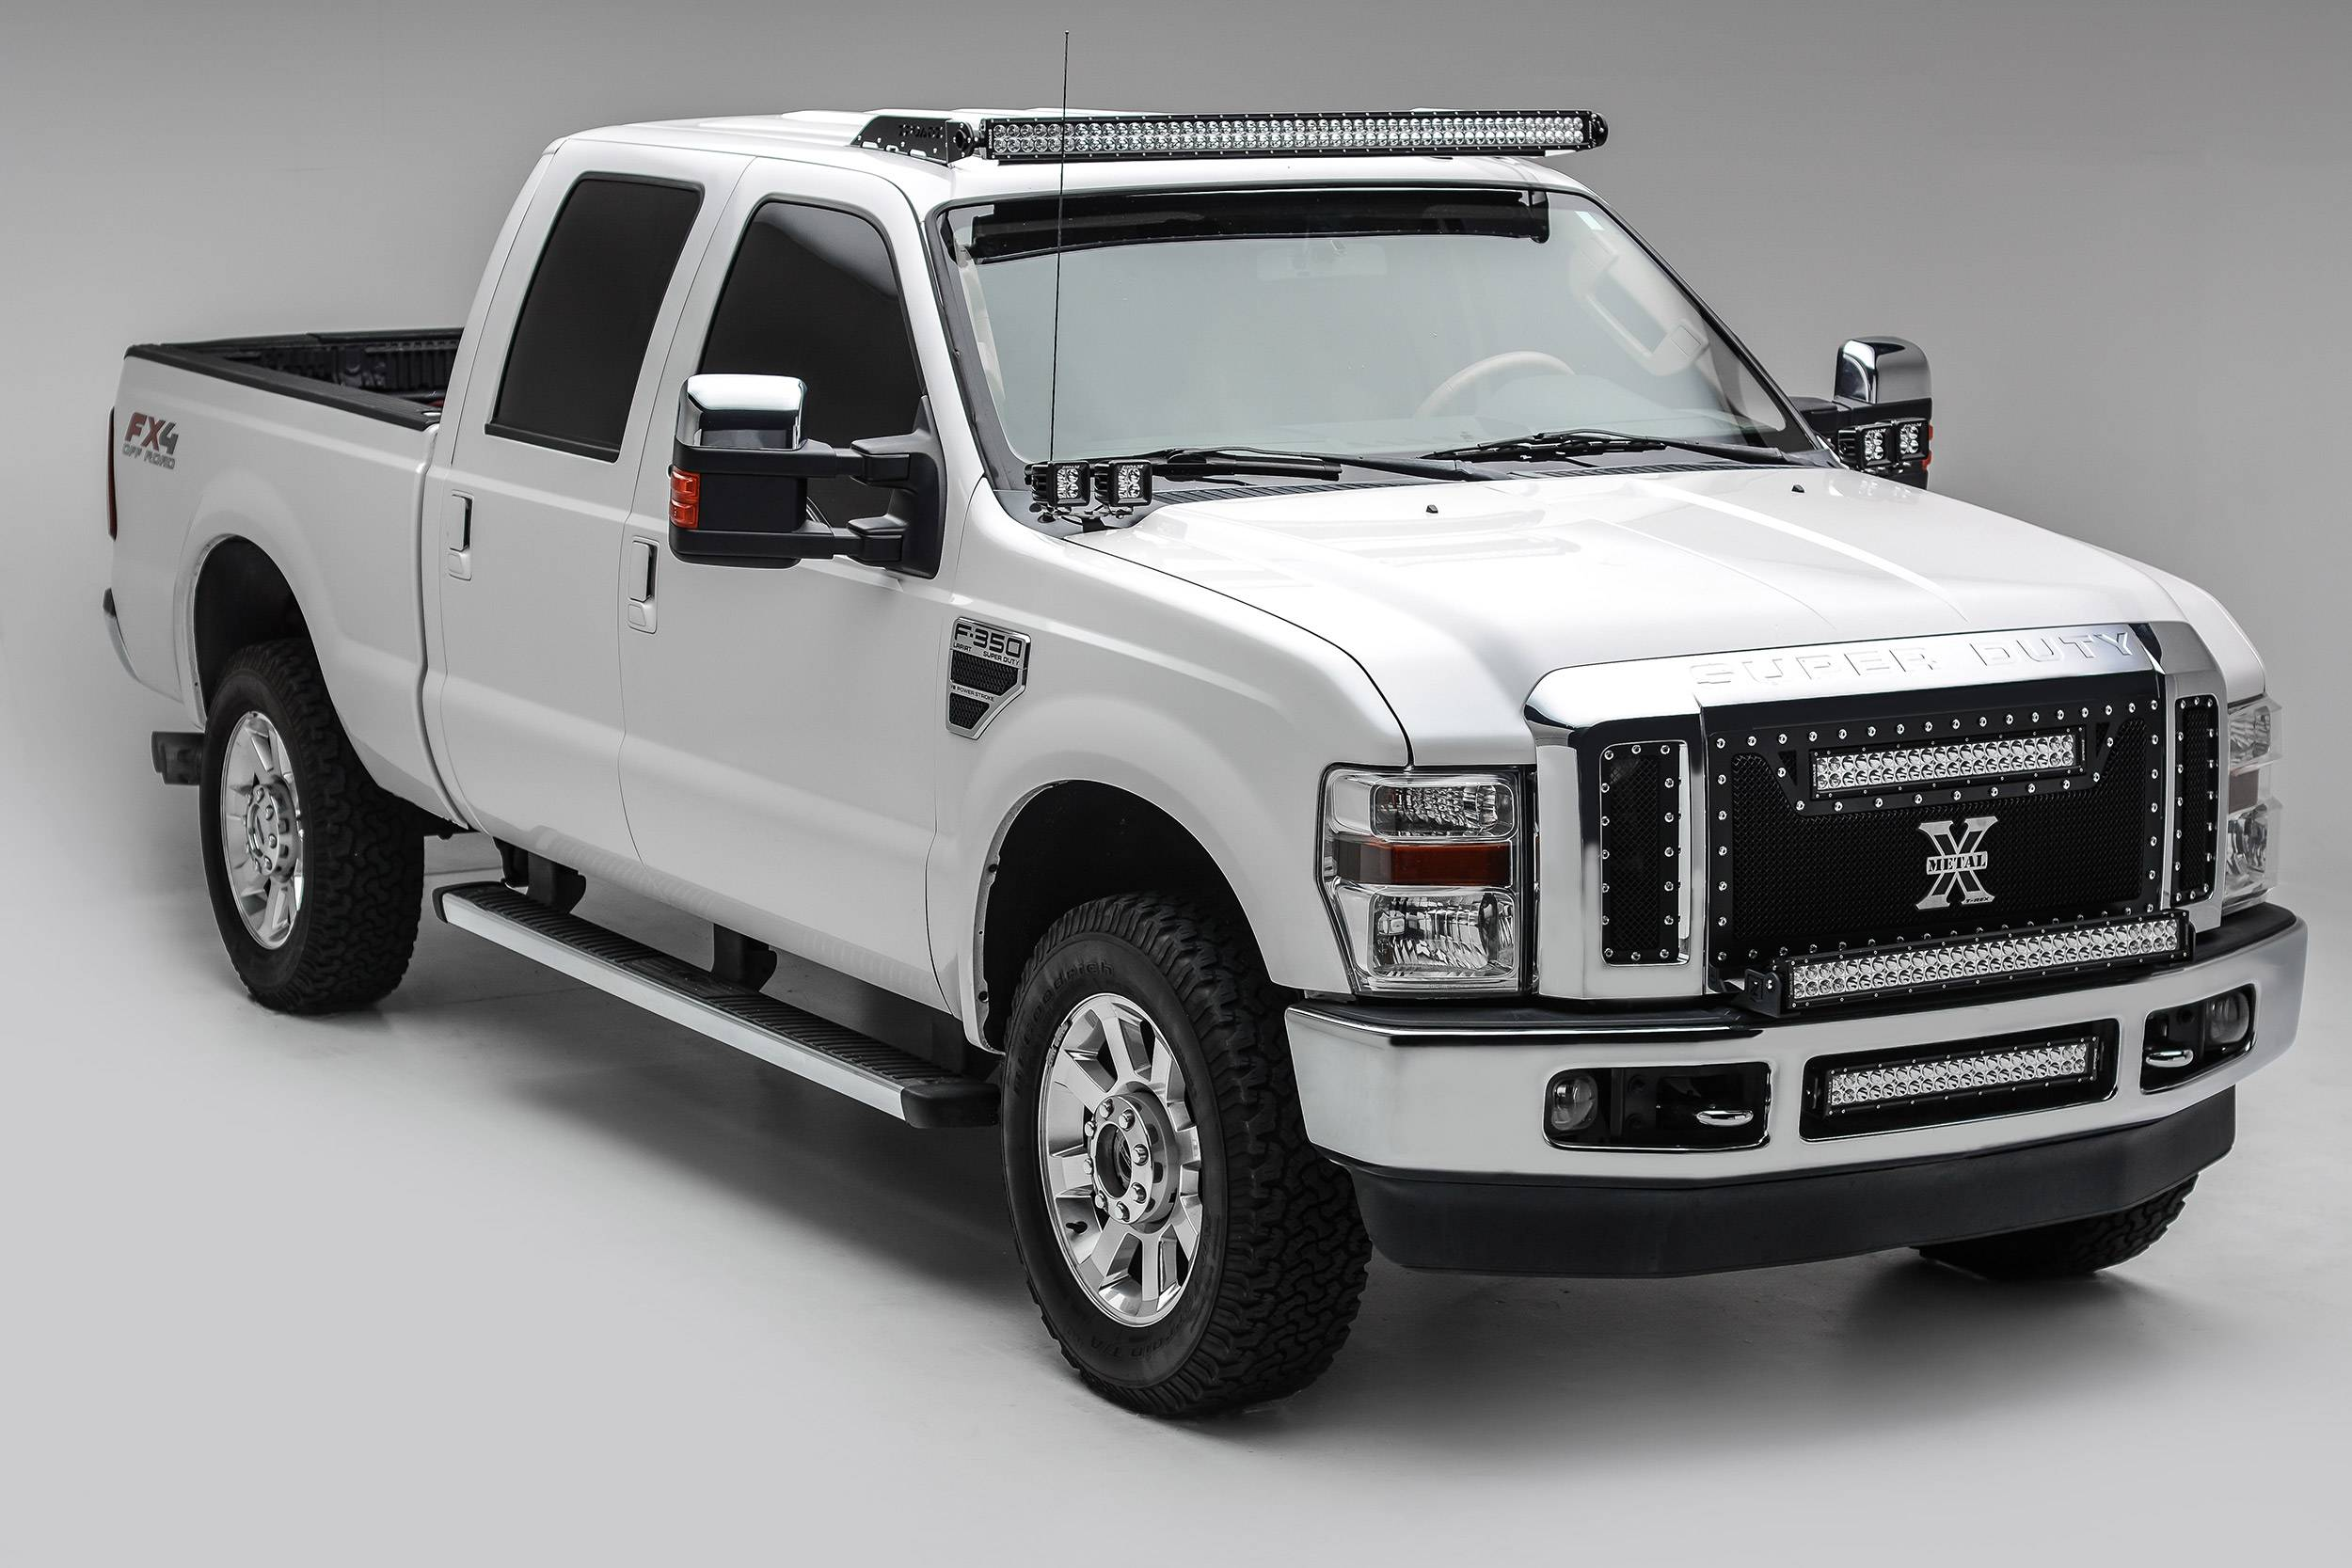 ZROADZ                                             - 2008-2010 Ford Super Duty Front Bumper Top LED Bracket to mount (1) 30 Inch LED Light Bar - PN #Z325631